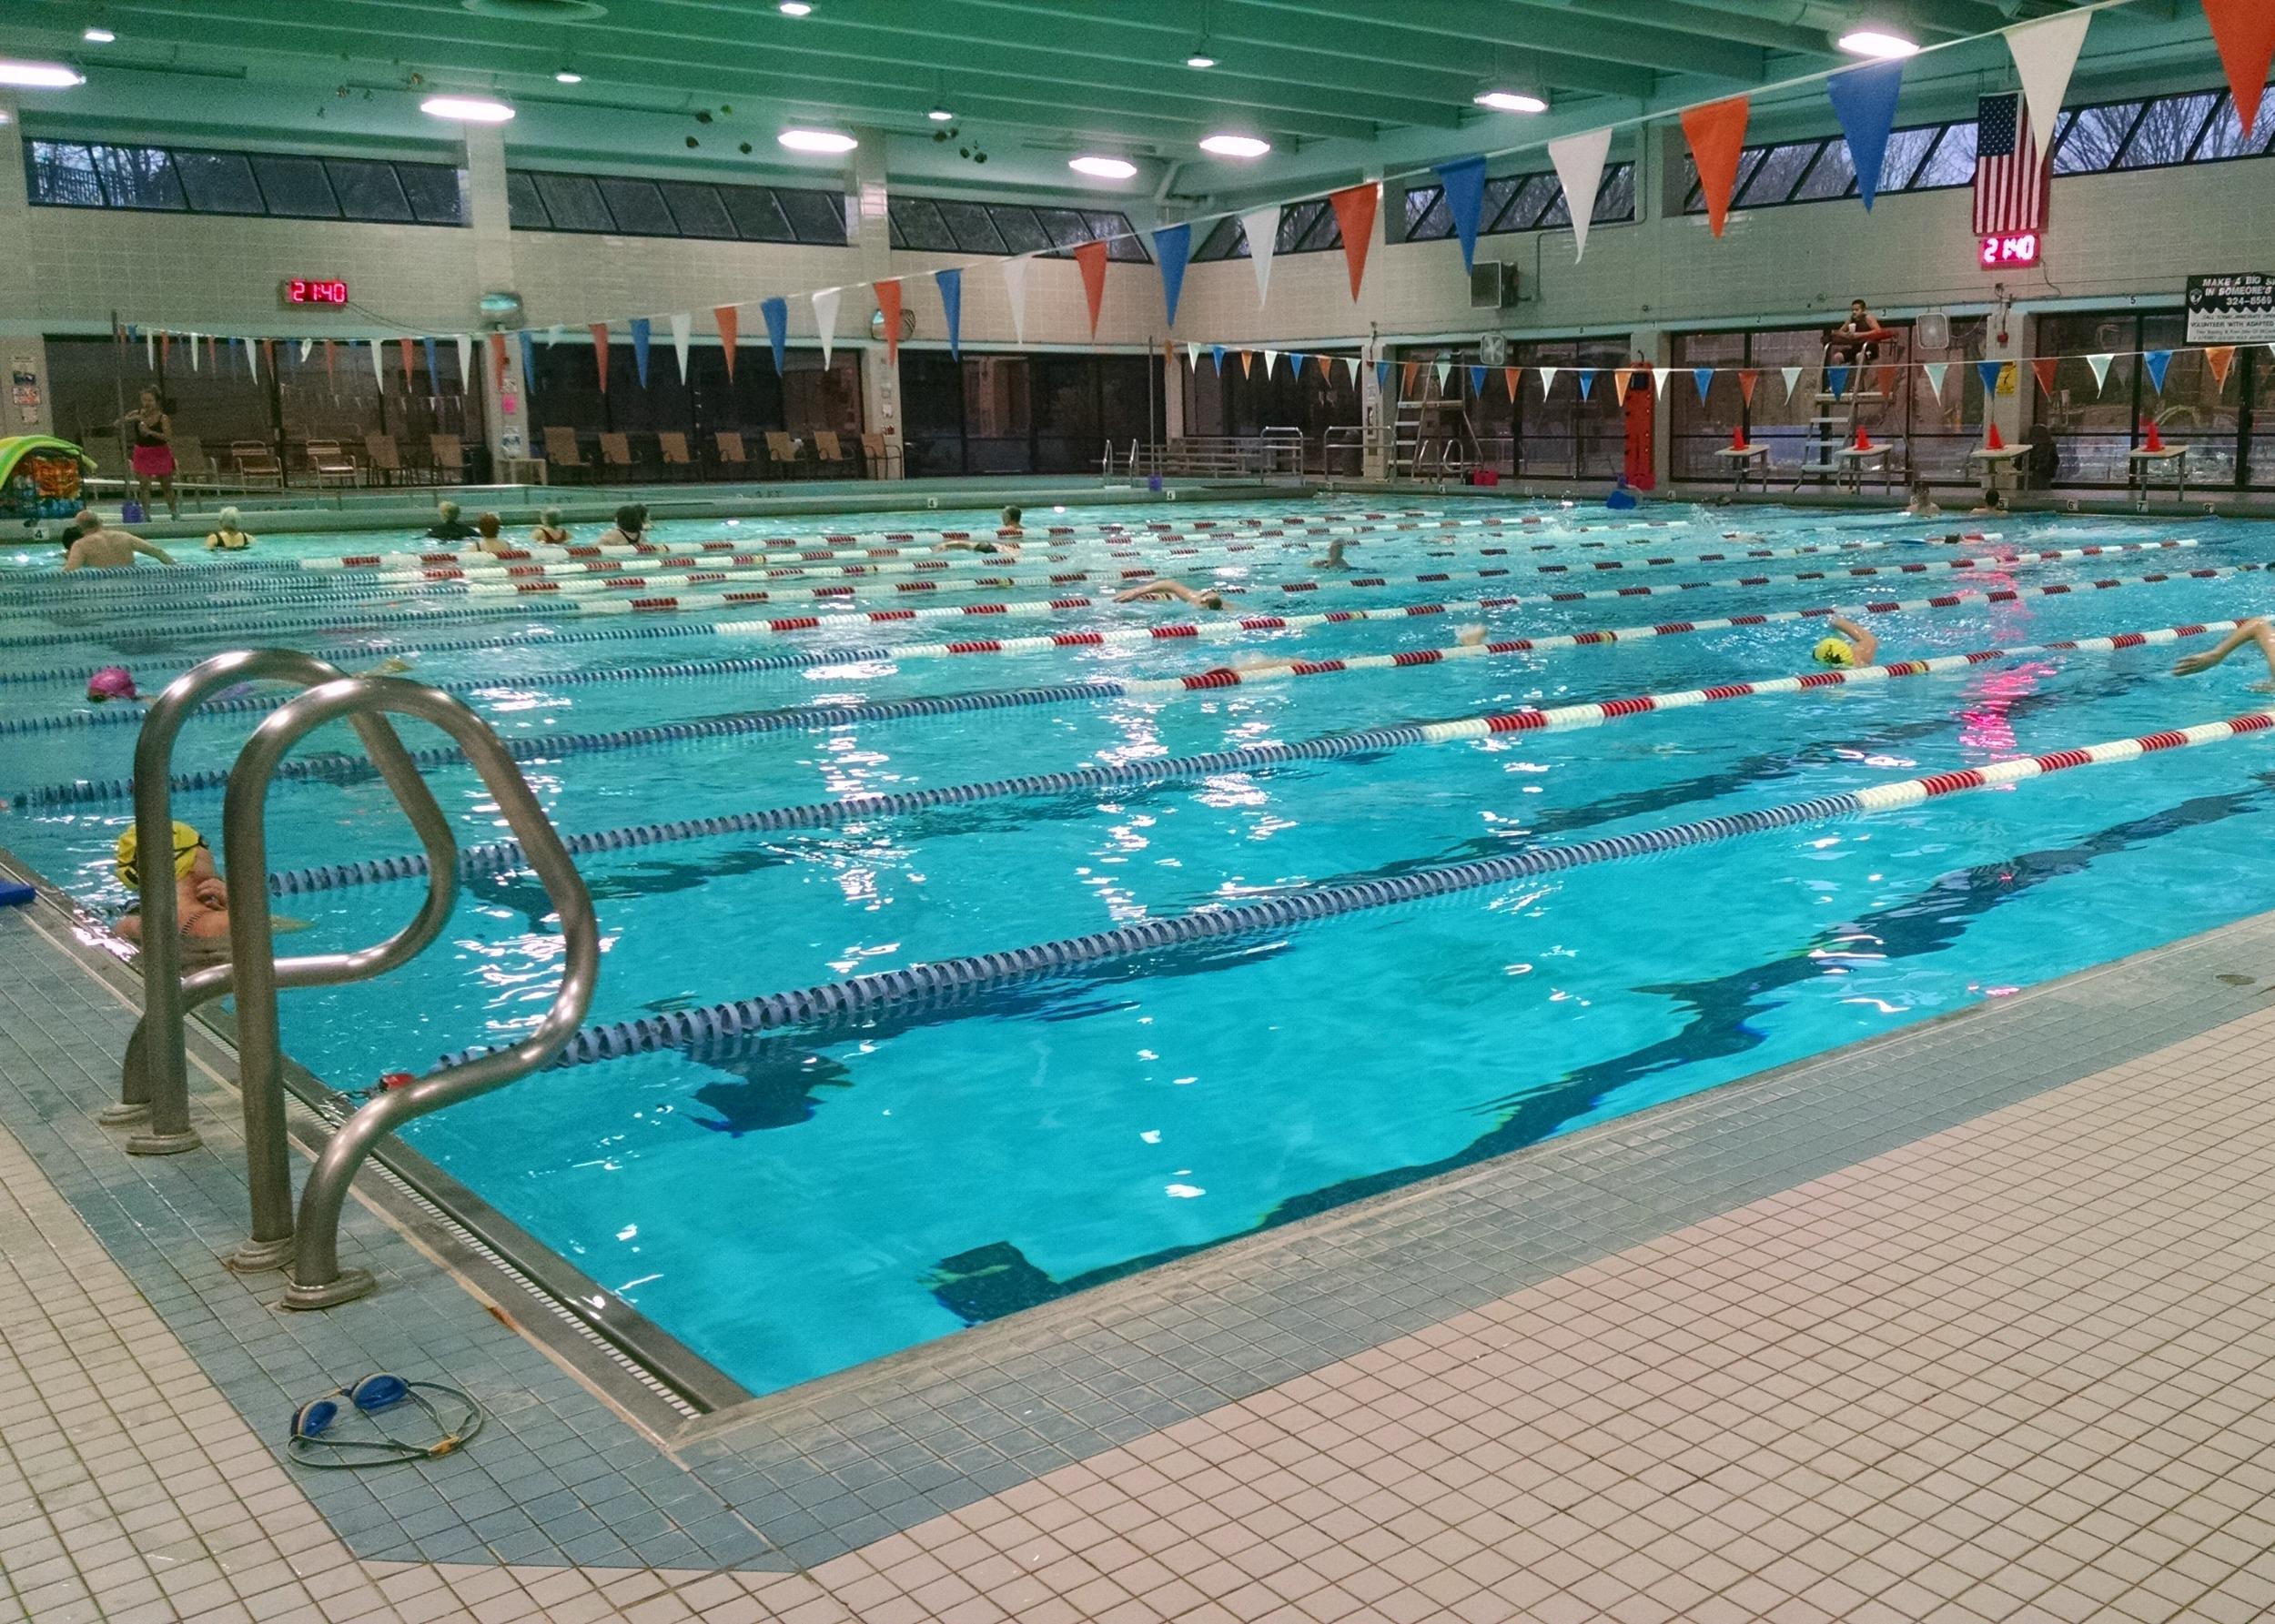 This week, Pool time = pain free time